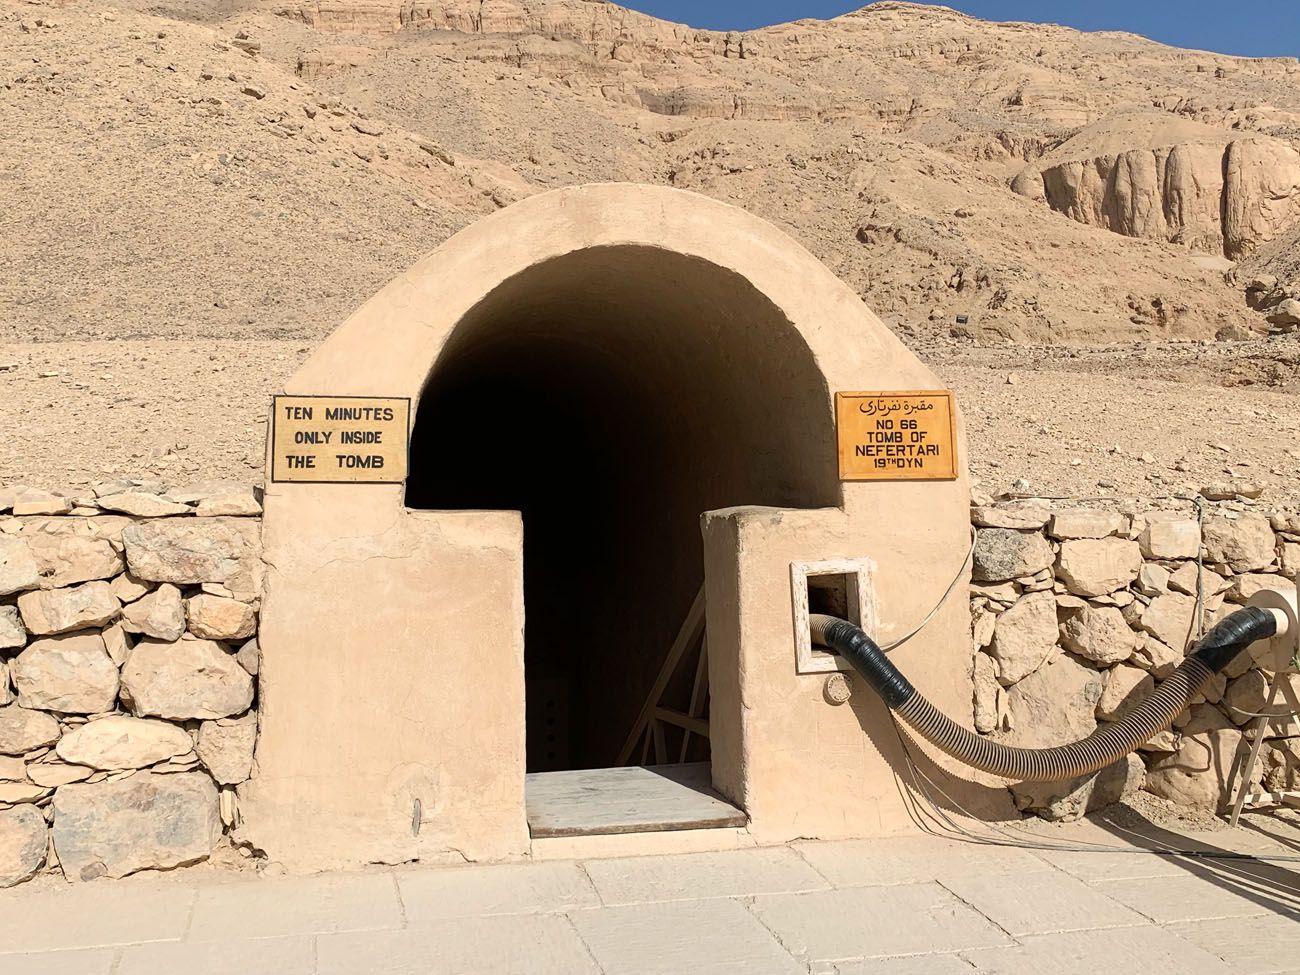 Tomb of Nefertari Entrance